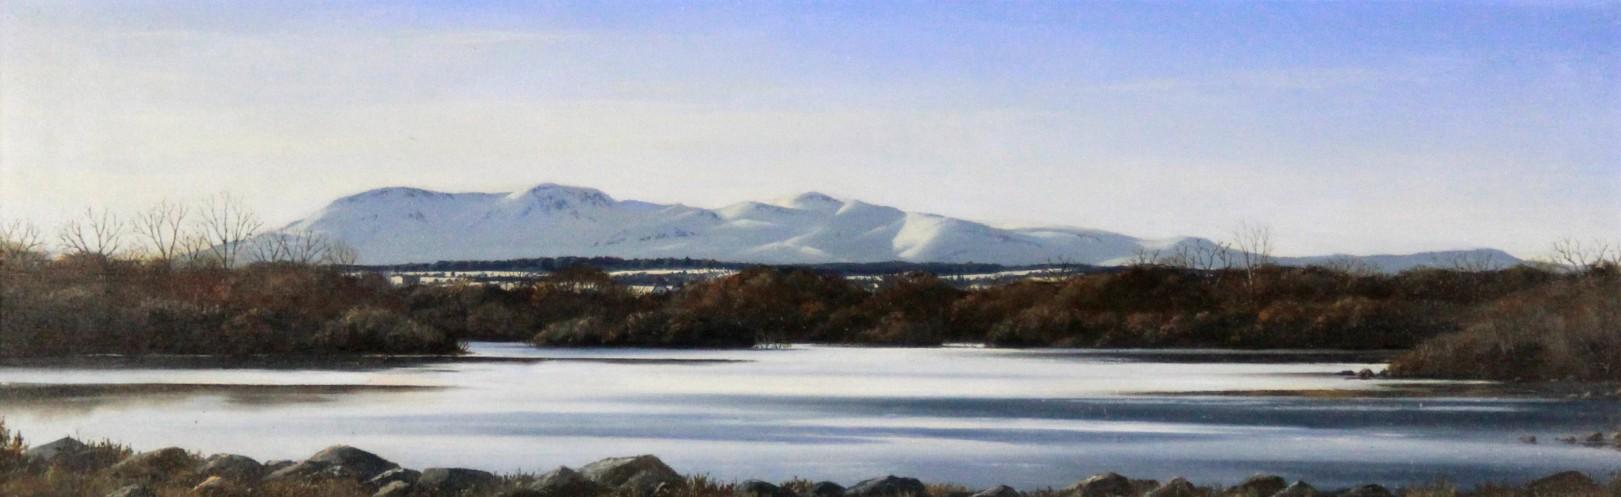 Ian Johnstone_The Pentlands from Duddingston Loch_Oils_6x18